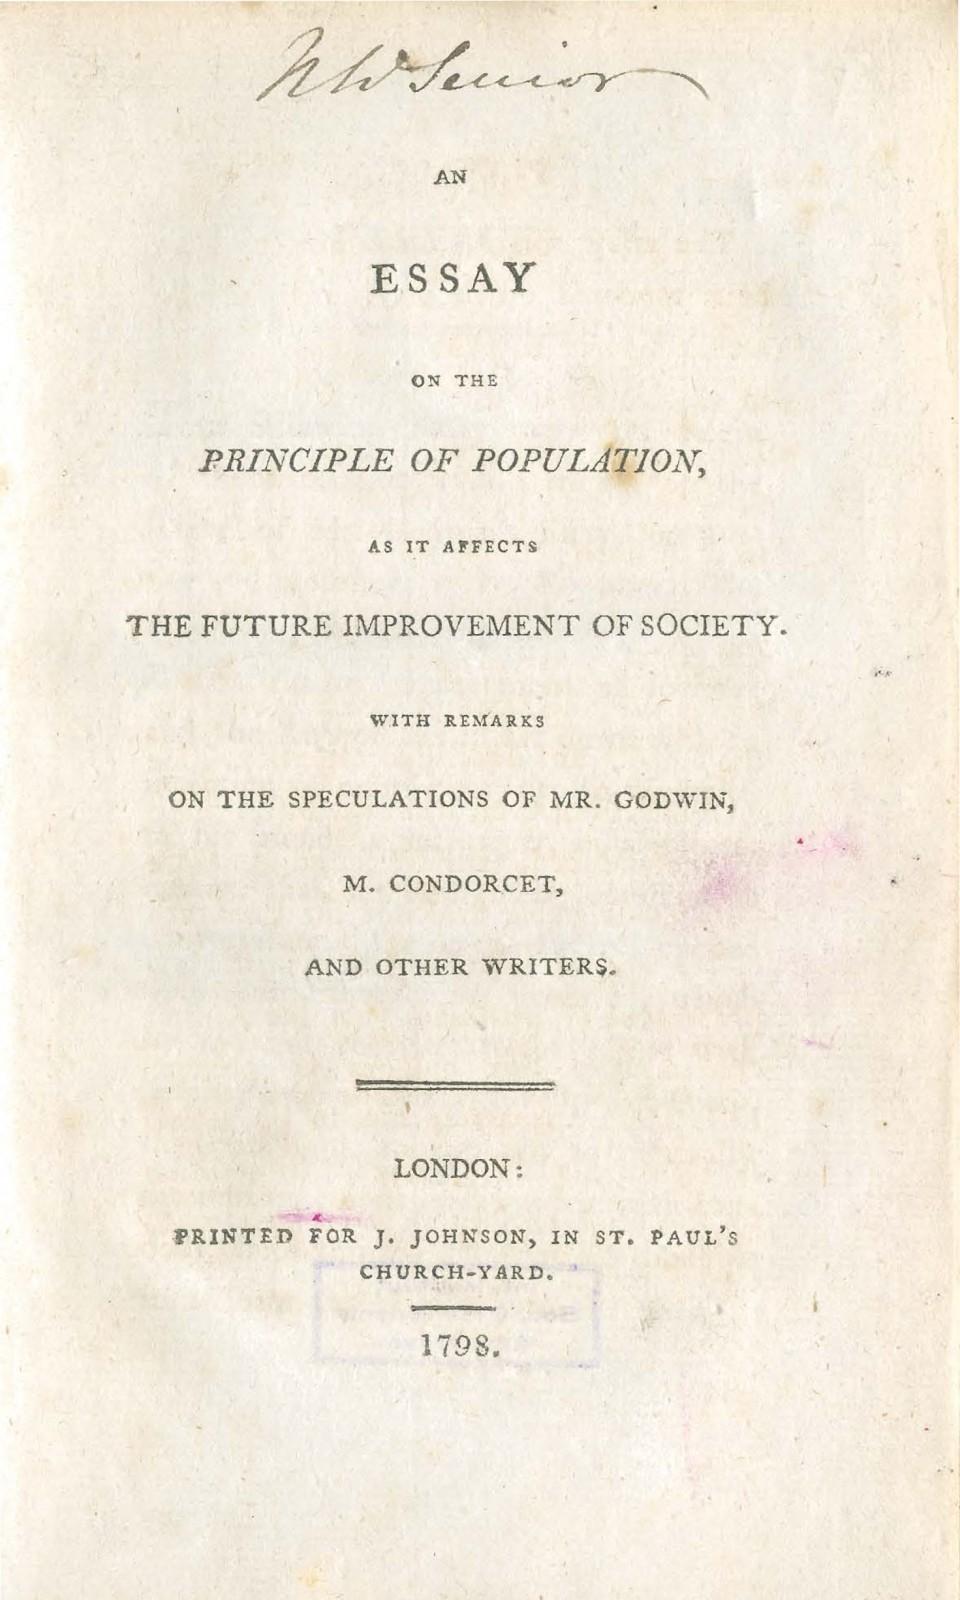 001 Essay On The Principle Of Population Singular Malthus Sparknotes Thomas Main Idea 960